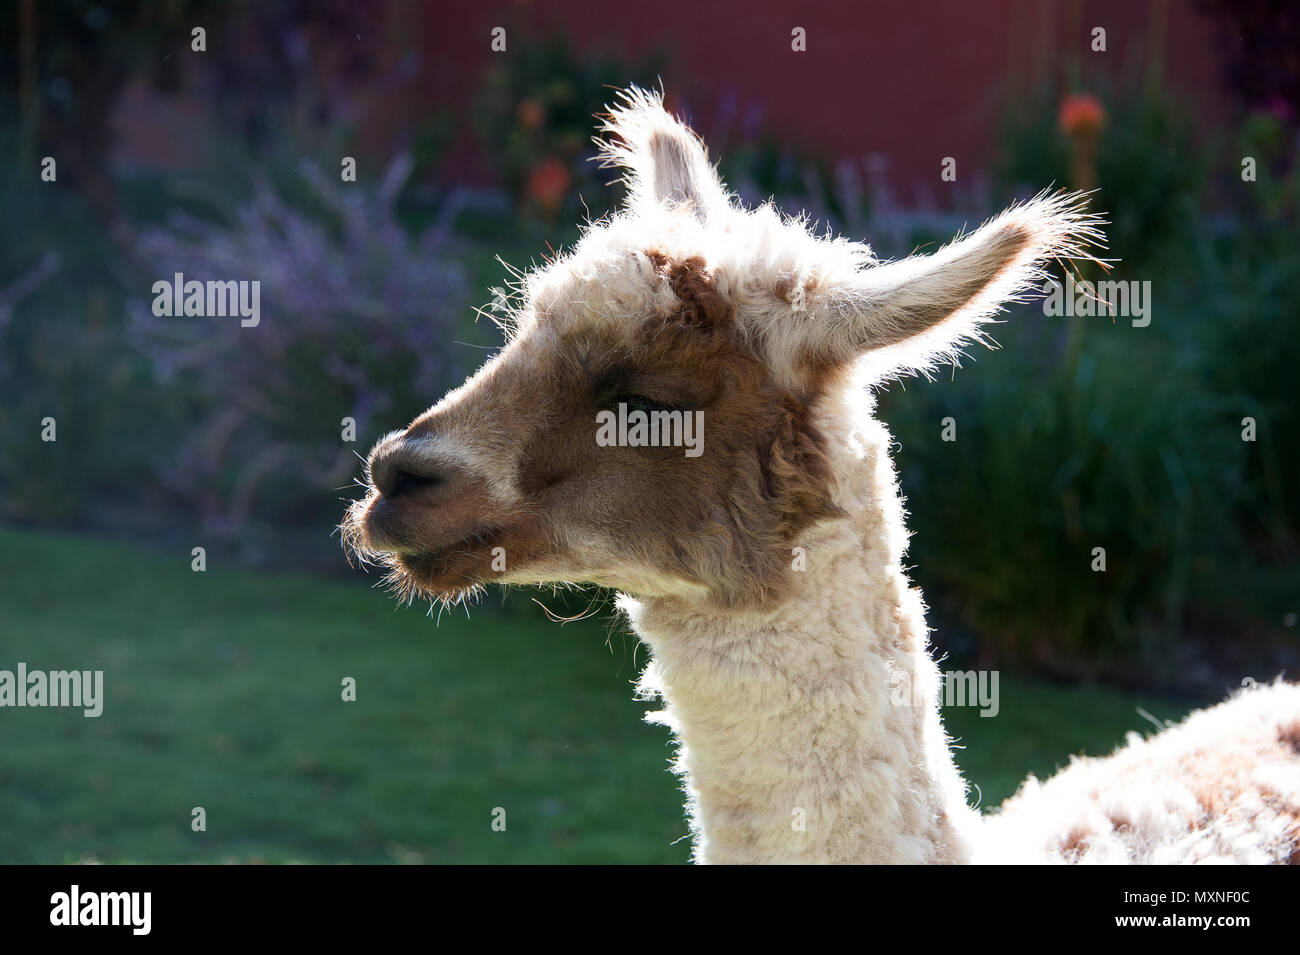 A young llama in Peru South America - Stock Image